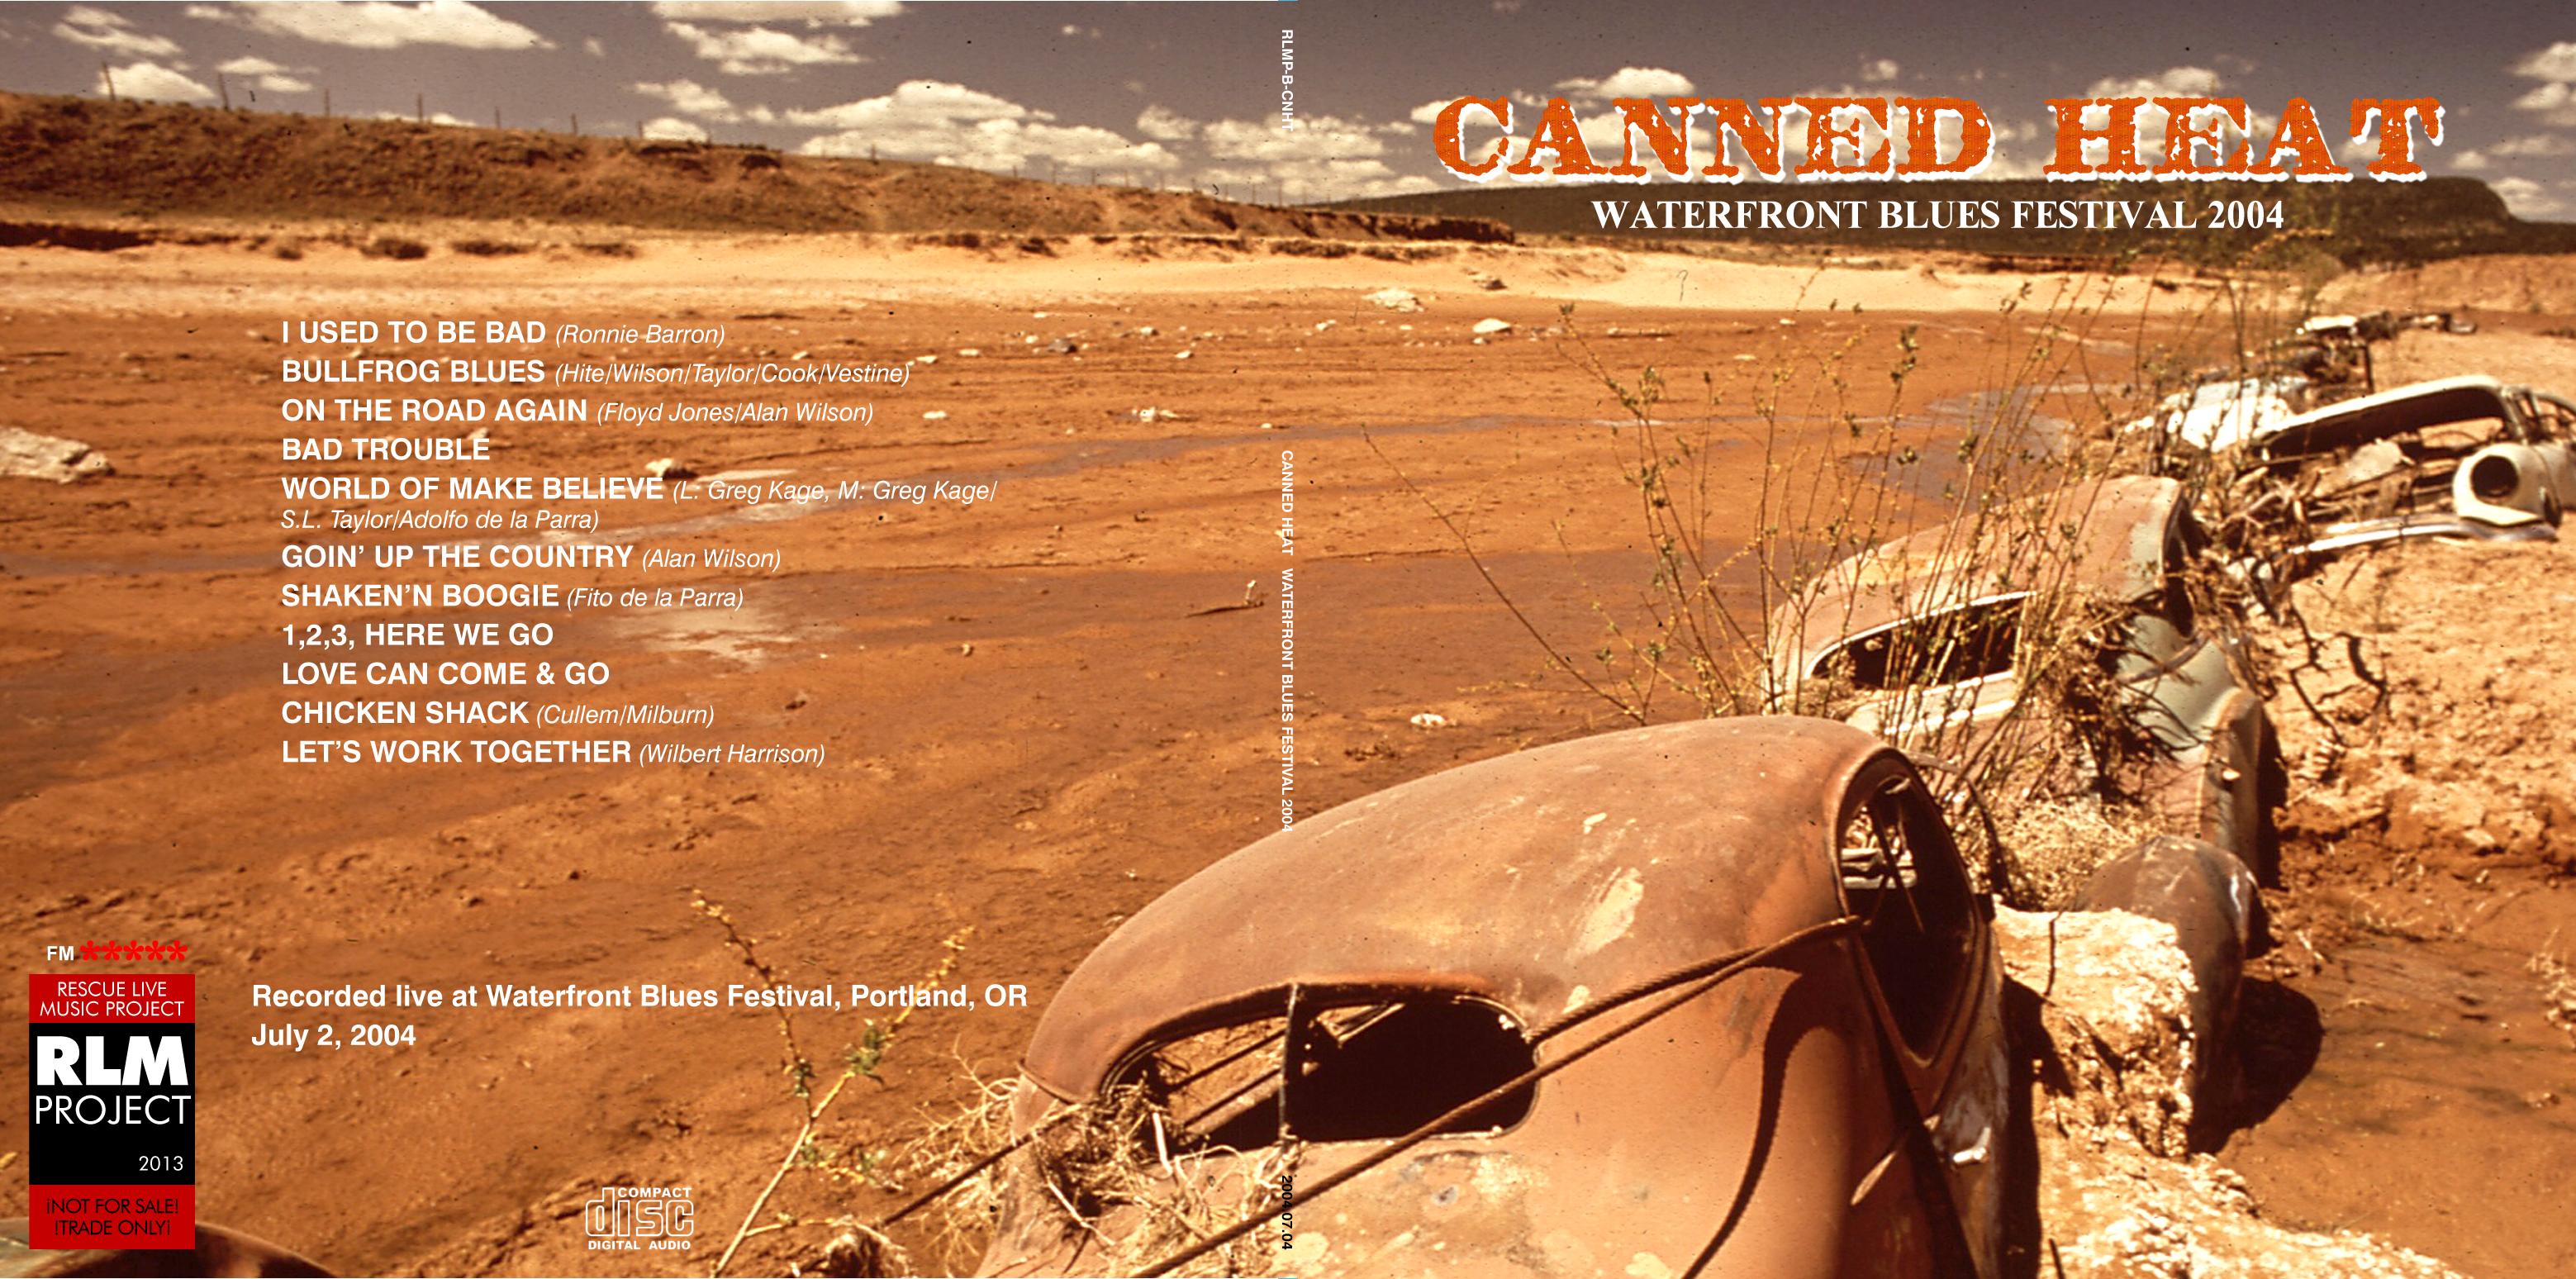 CannedHeat2004-07-02WaterfrontBluesFestivalPortlandOR1.png